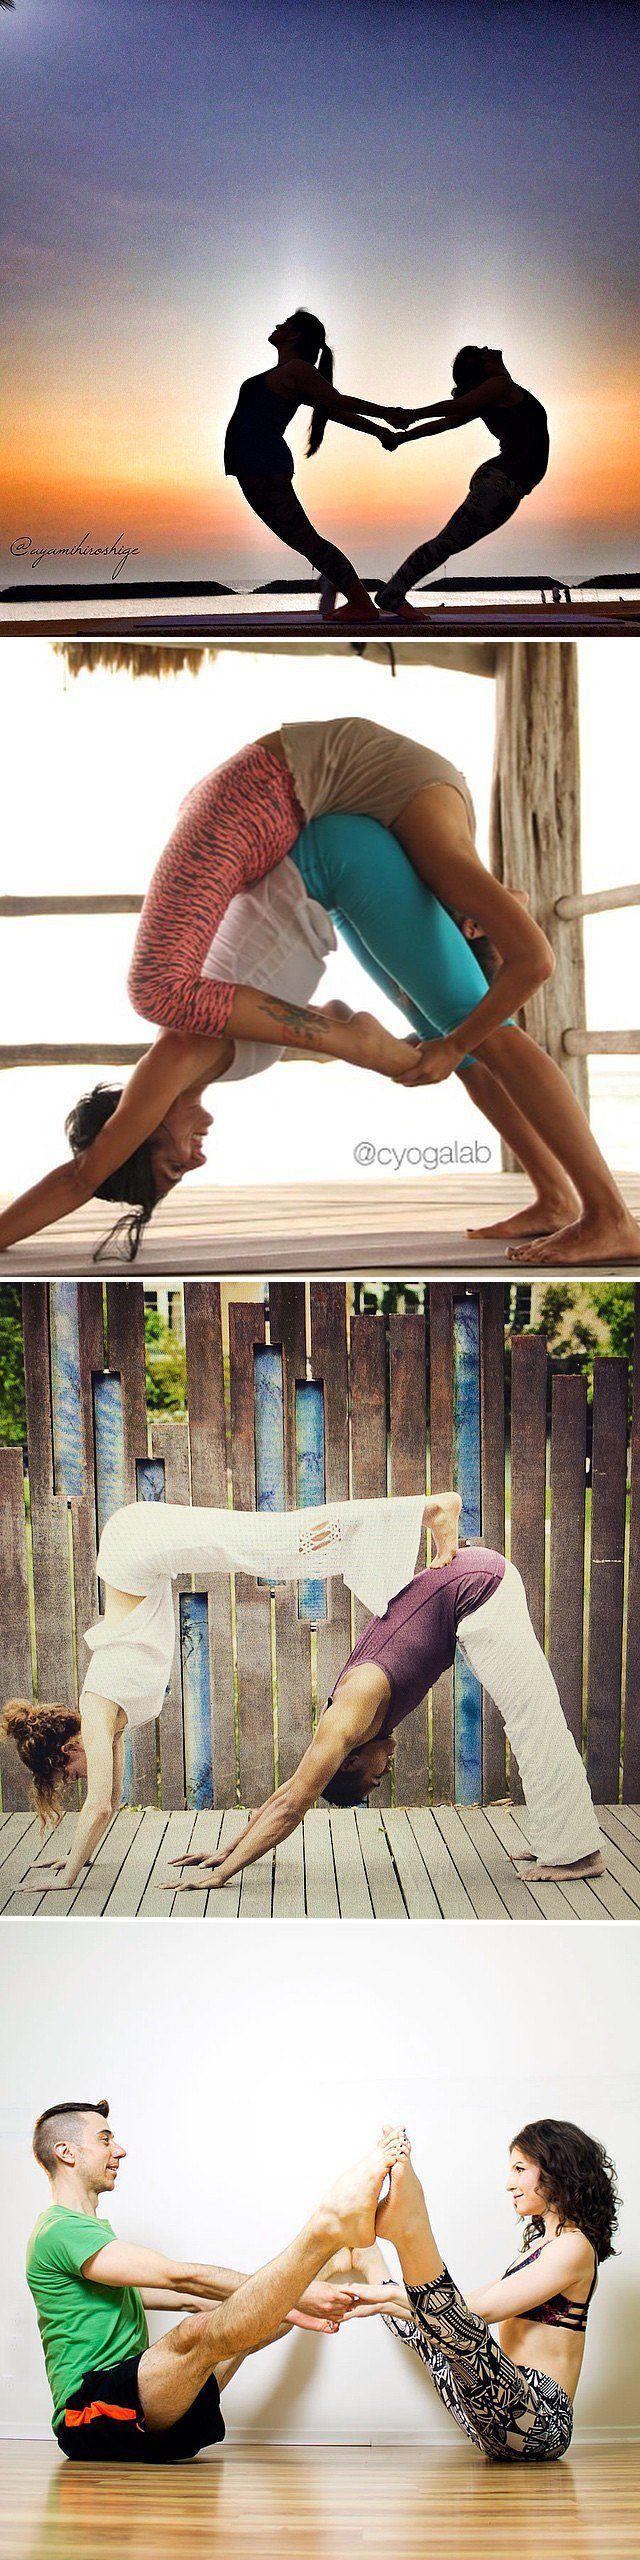 Amo la yoga en pareja!!!! #yoga #pareja #complemento